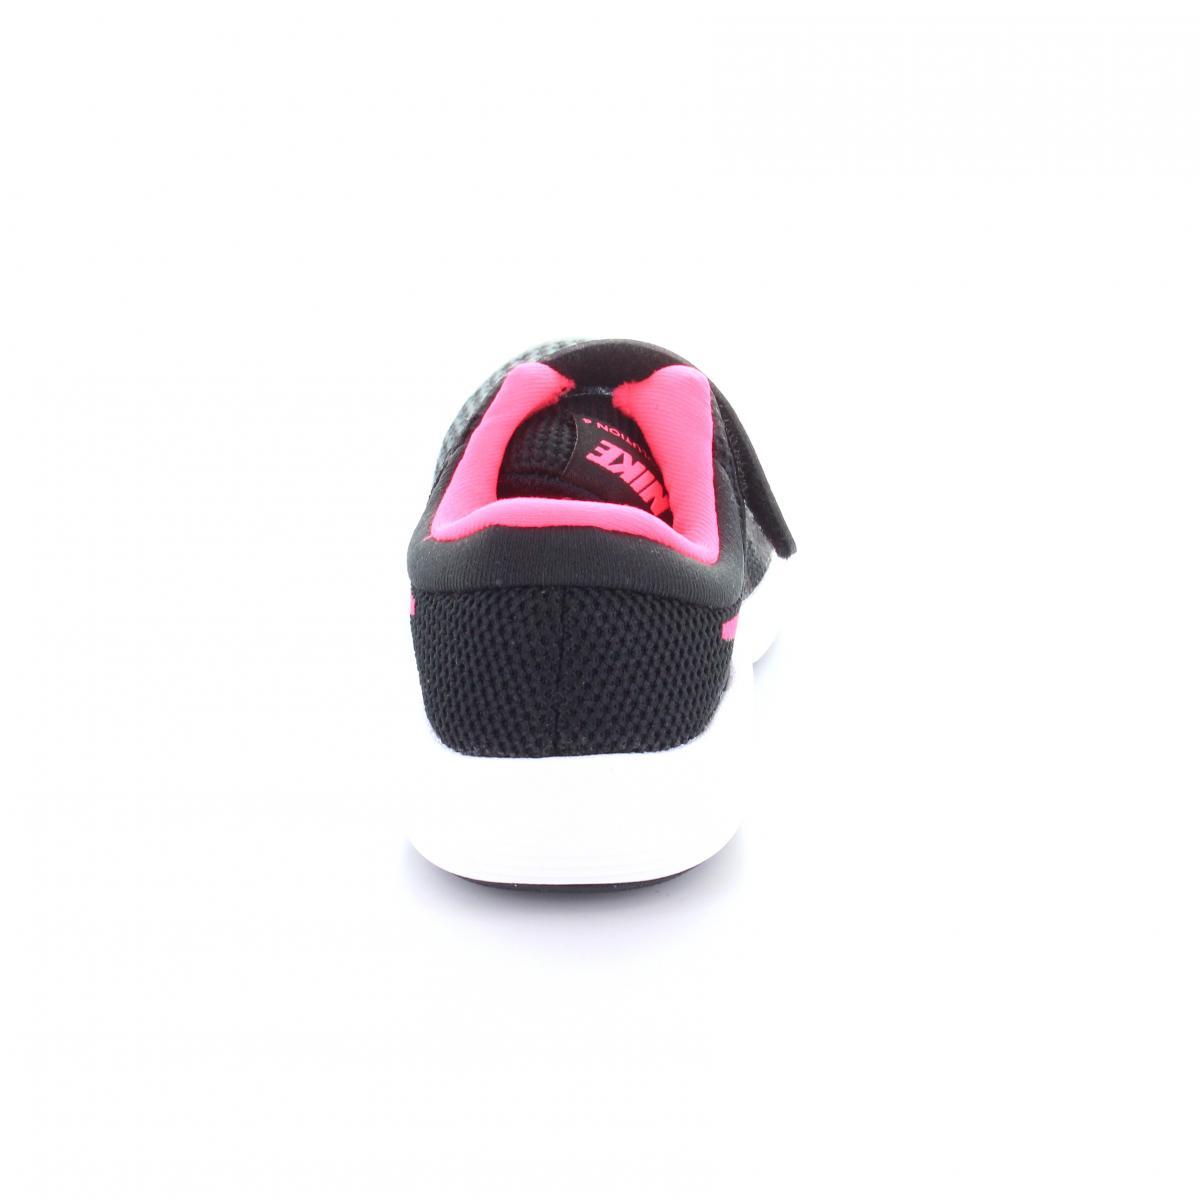 ... Tenis para Niña Nike 943307-004 Color Negro ... ffcdb918e62c6